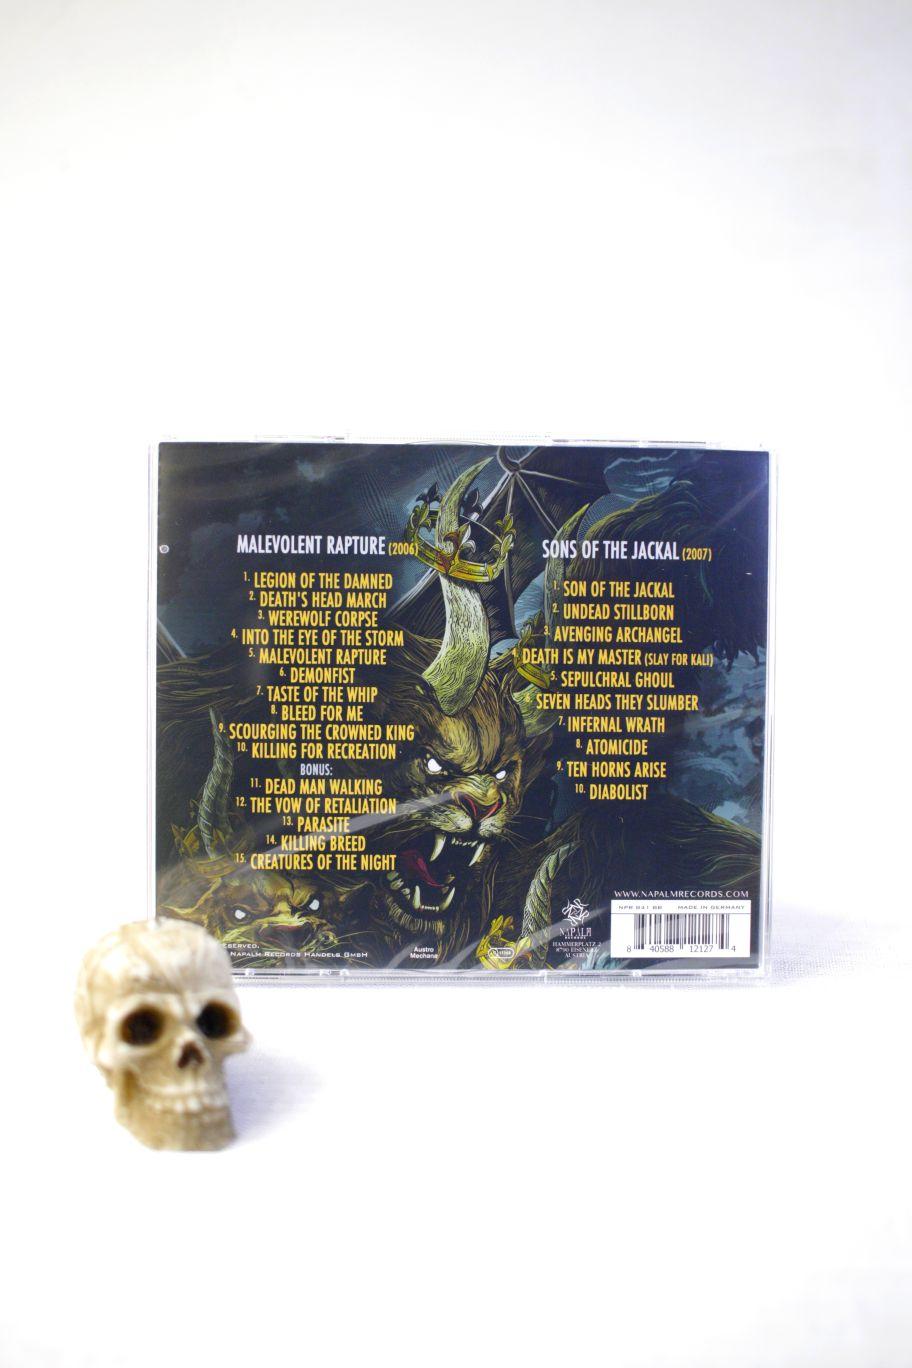 CD LEGION OF THE DAMNED MALEVOLENT RAPTURE SONS OF THE JACKAL